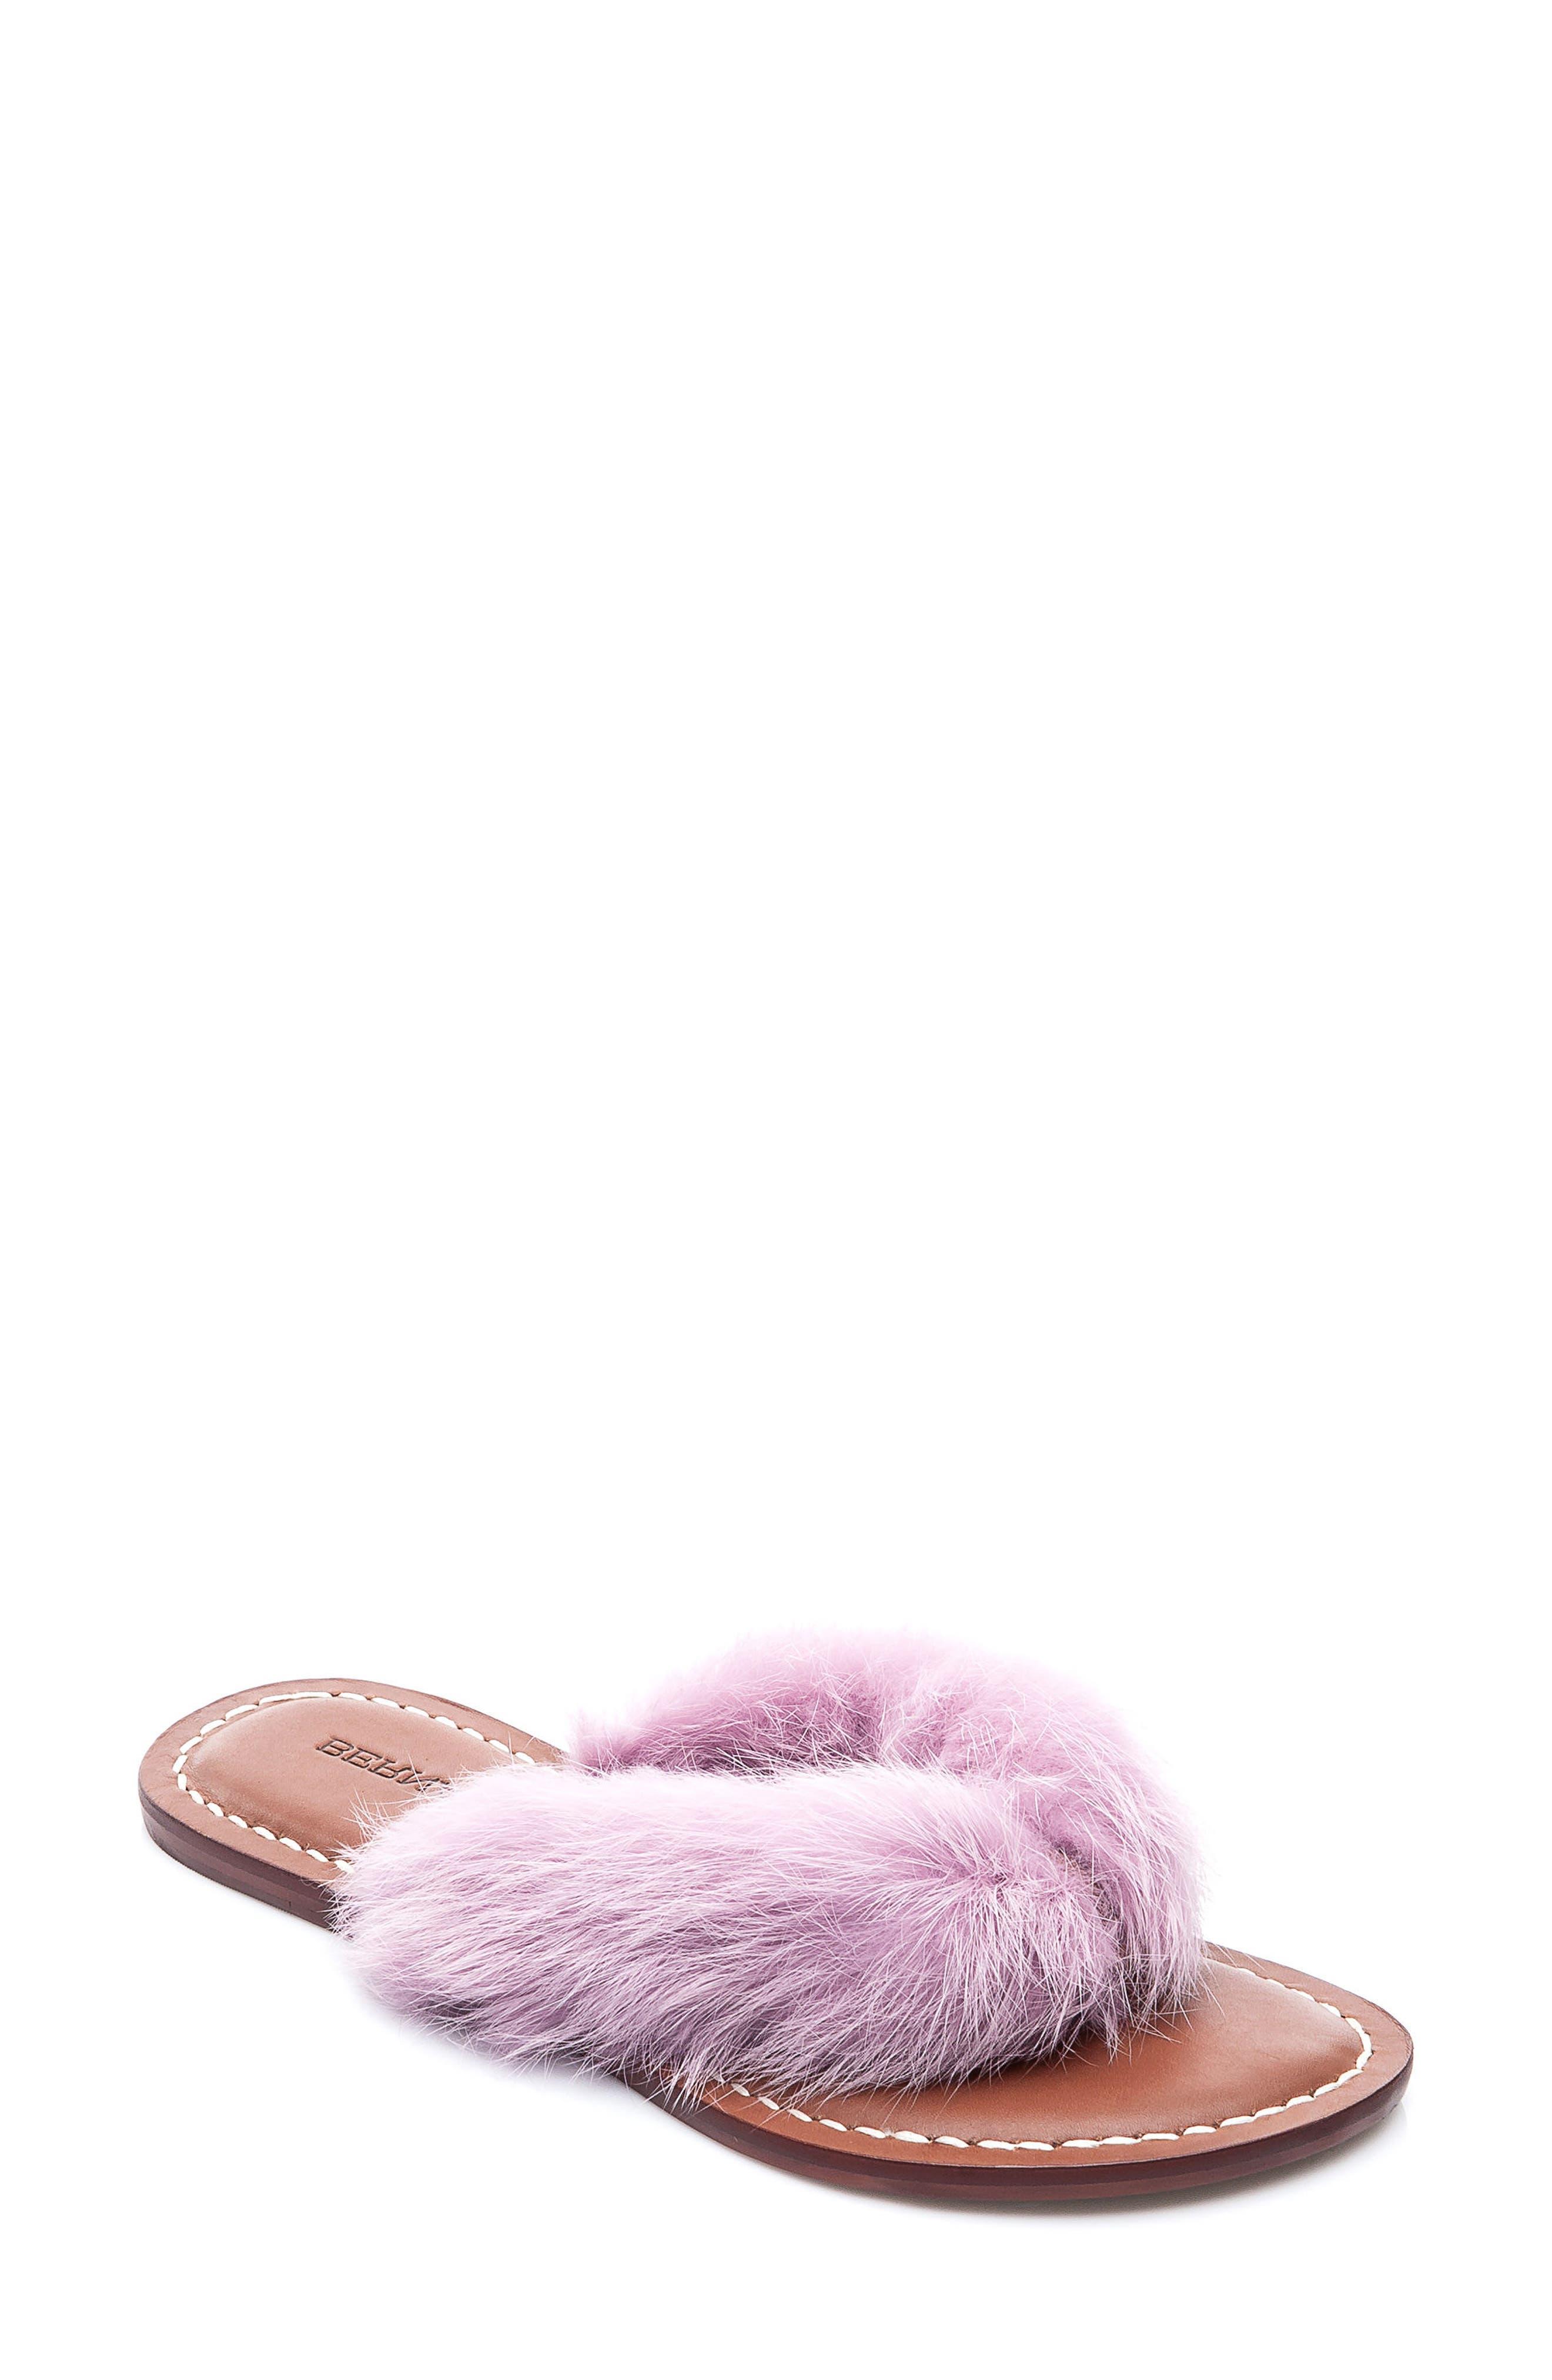 Genuine Rabbit Fur Flip Flop,                         Main,                         color, Light Pink Fur